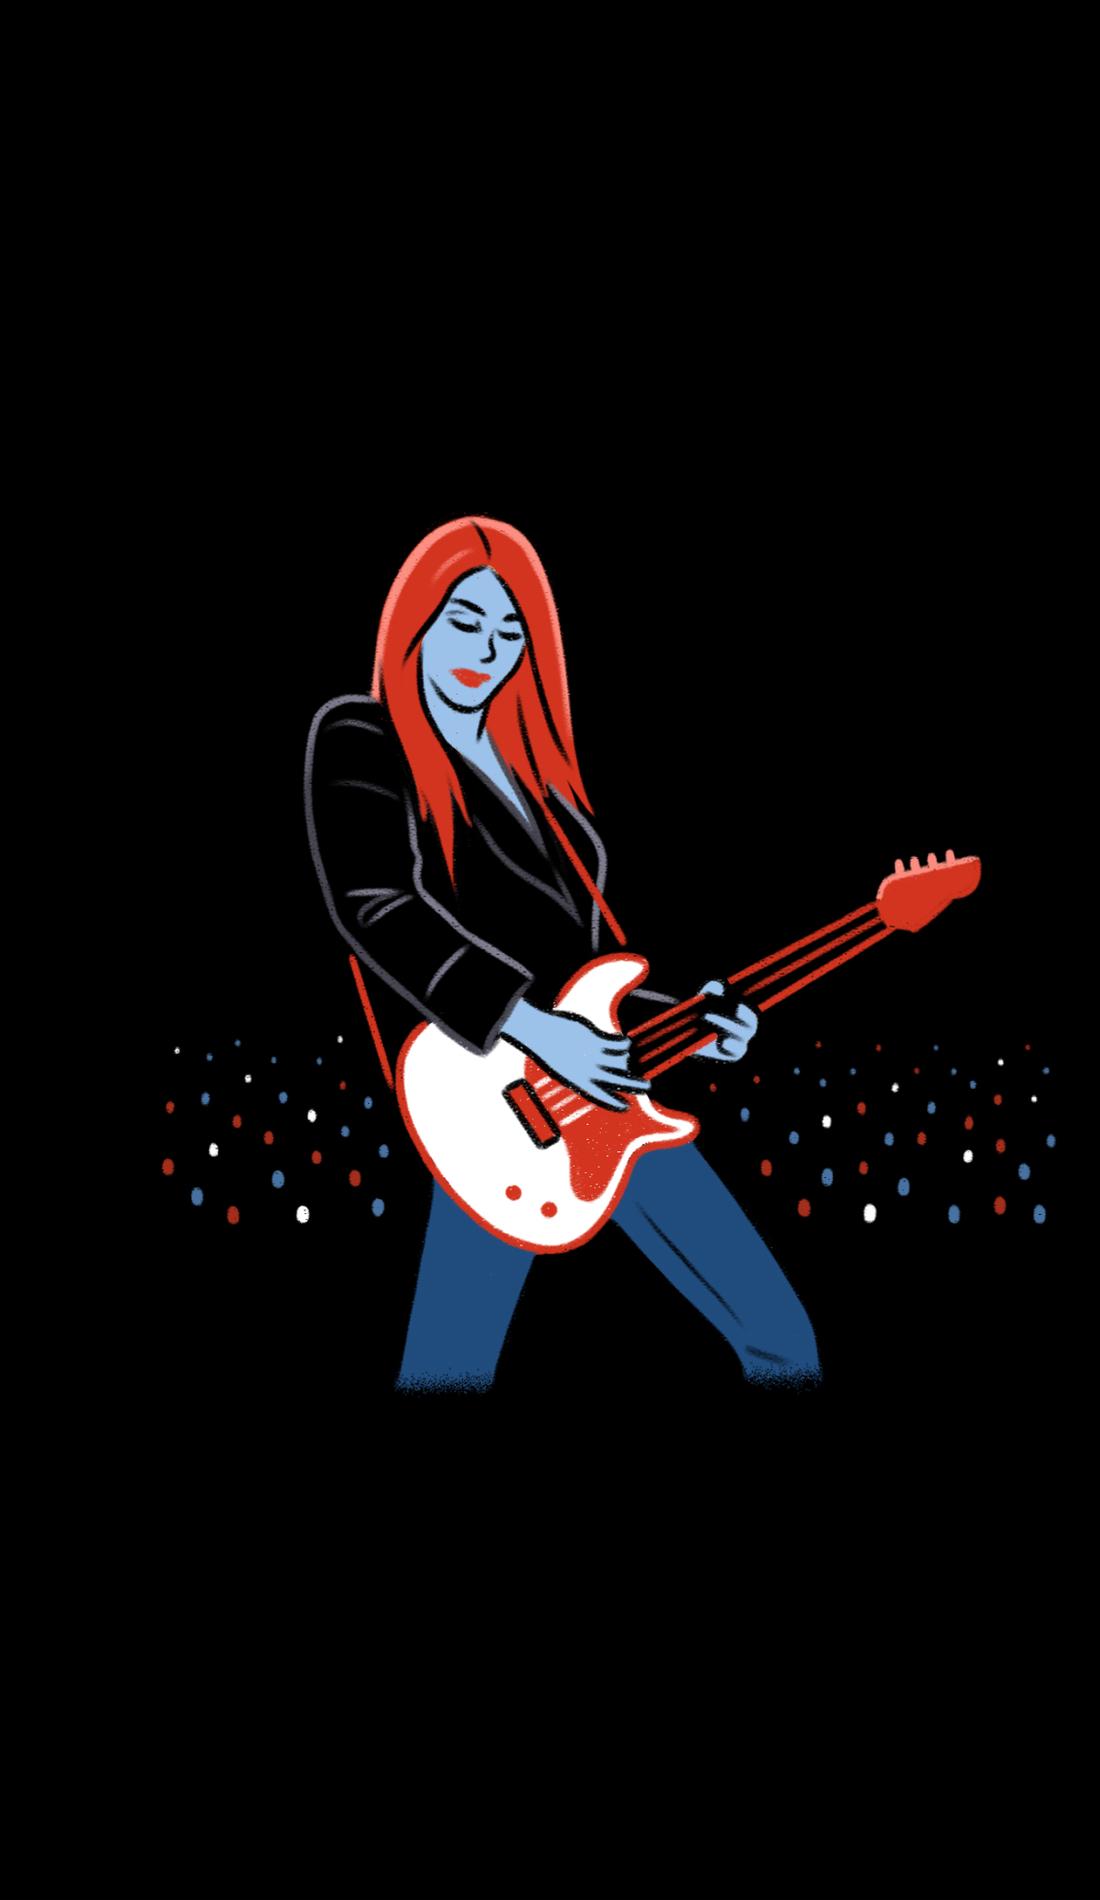 A Perta - Band live event